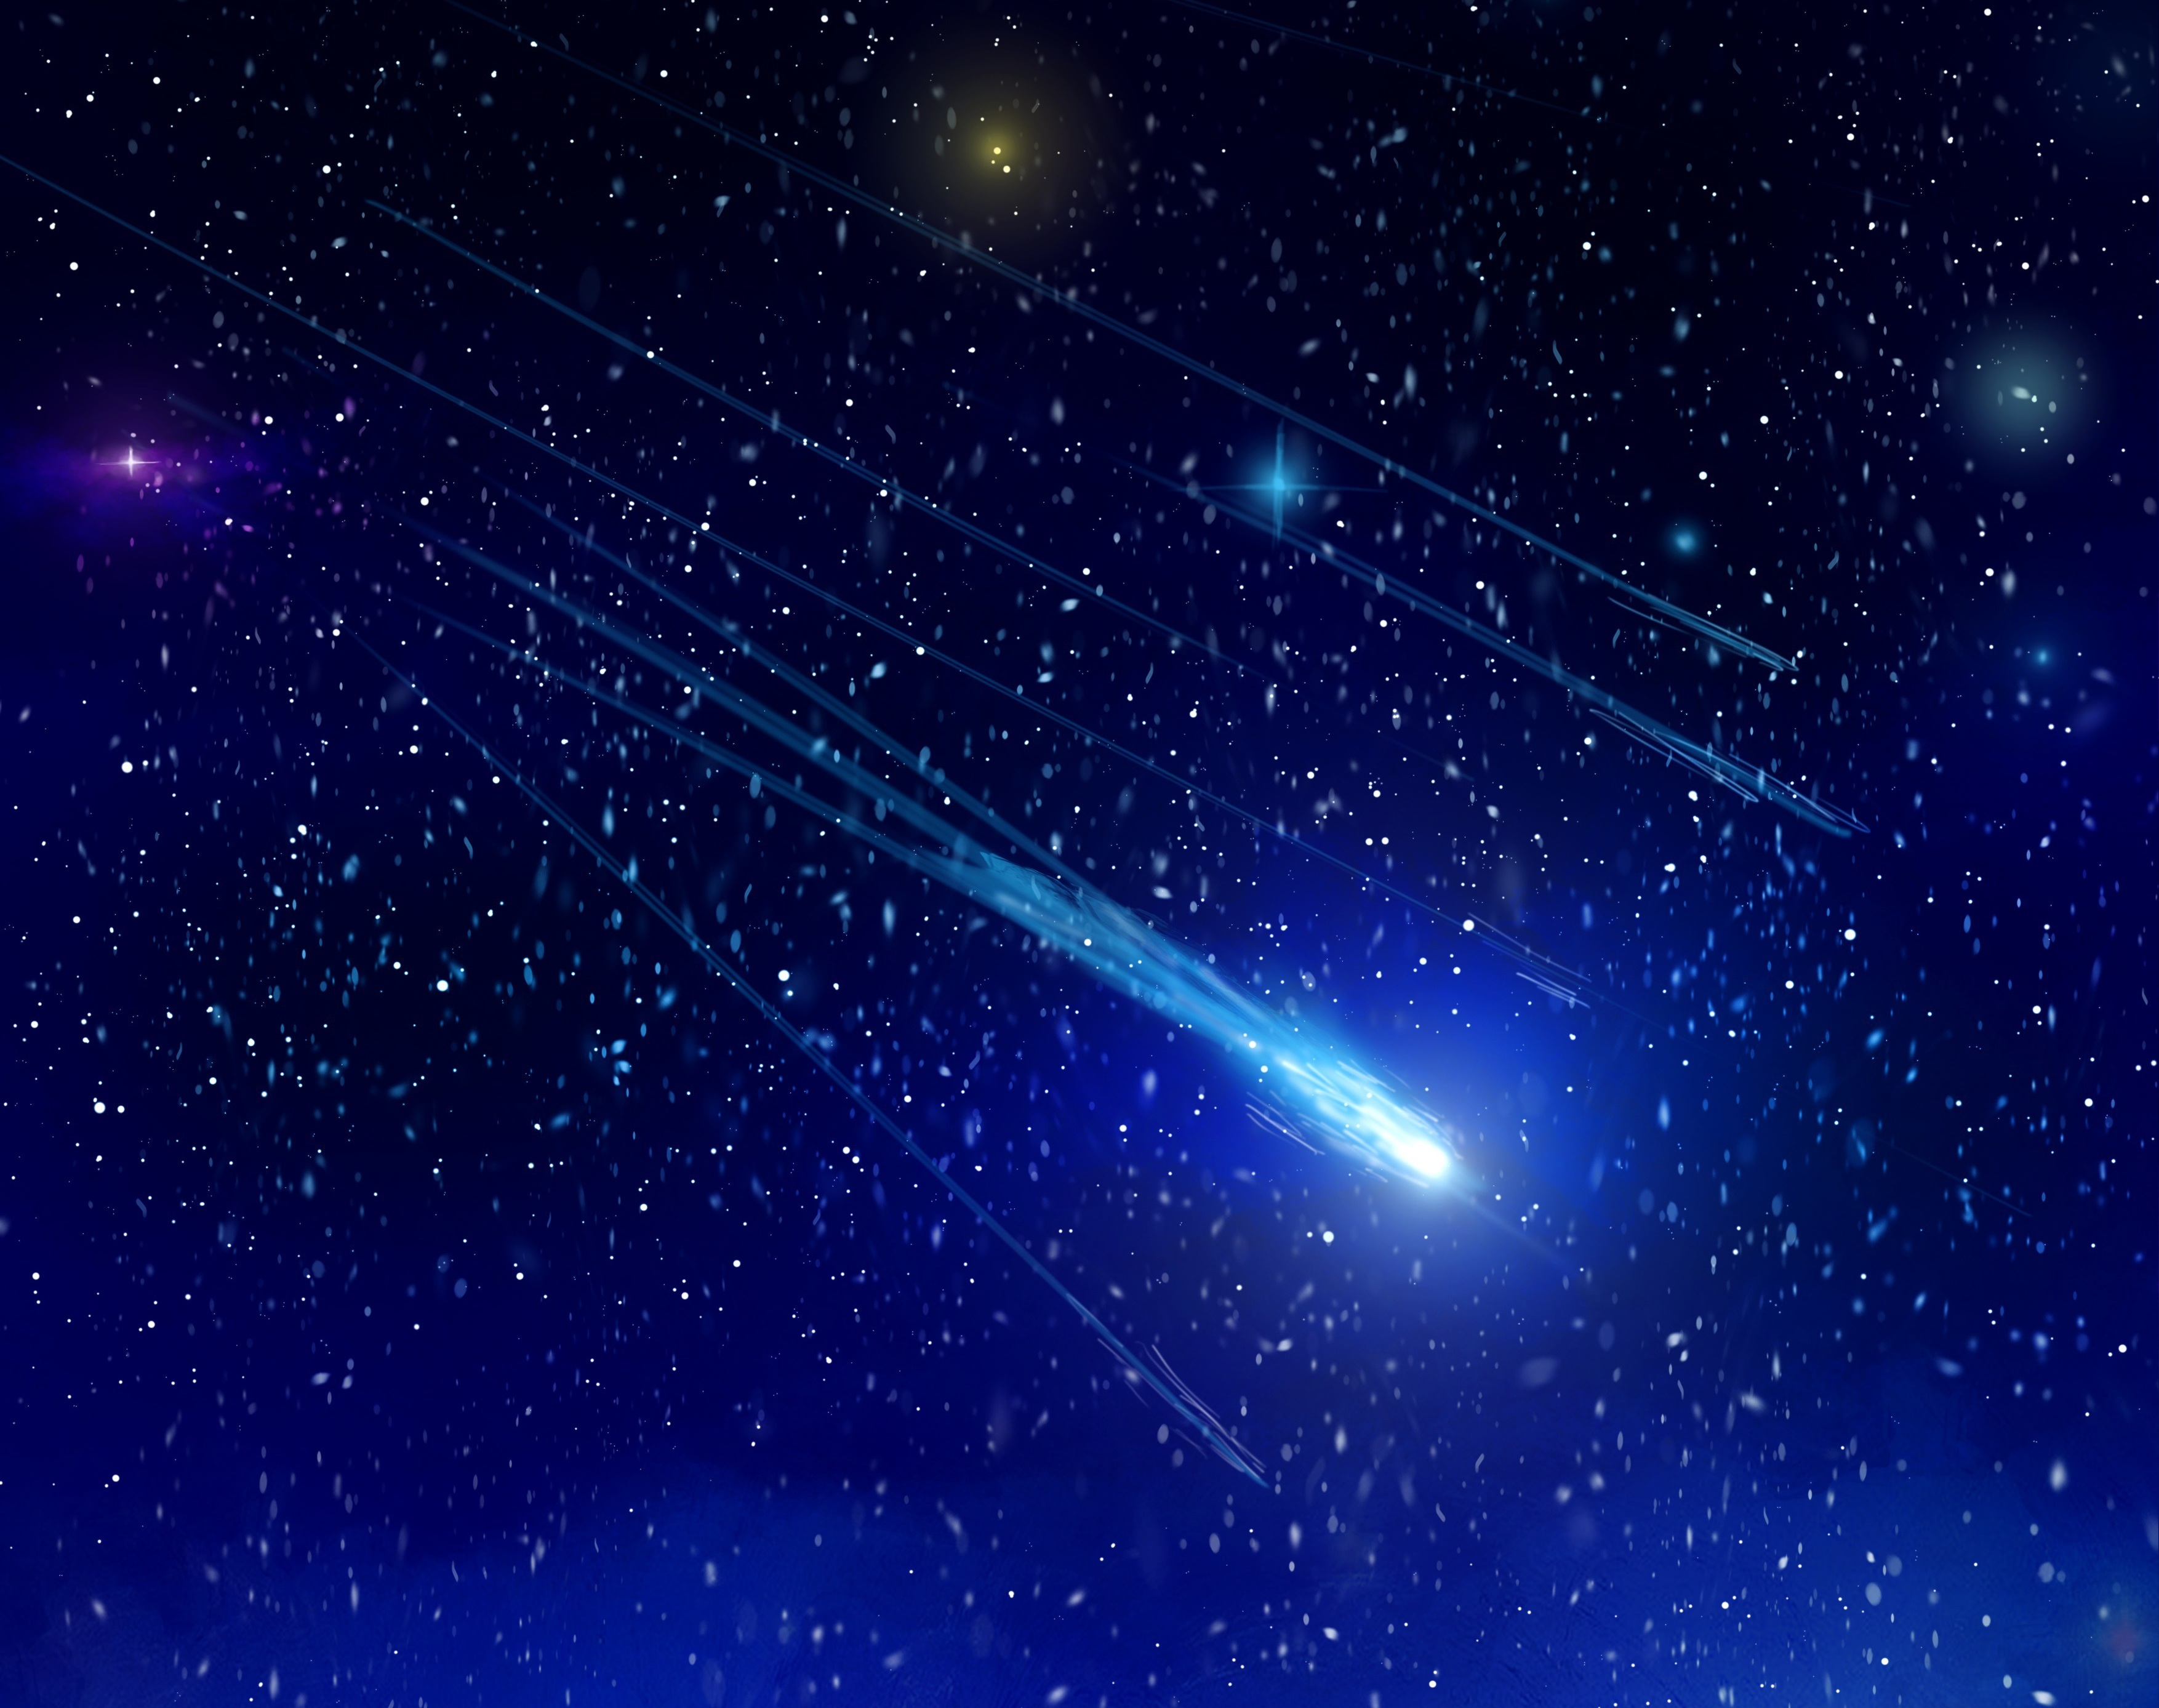 amazing shooting stars space - photo #19